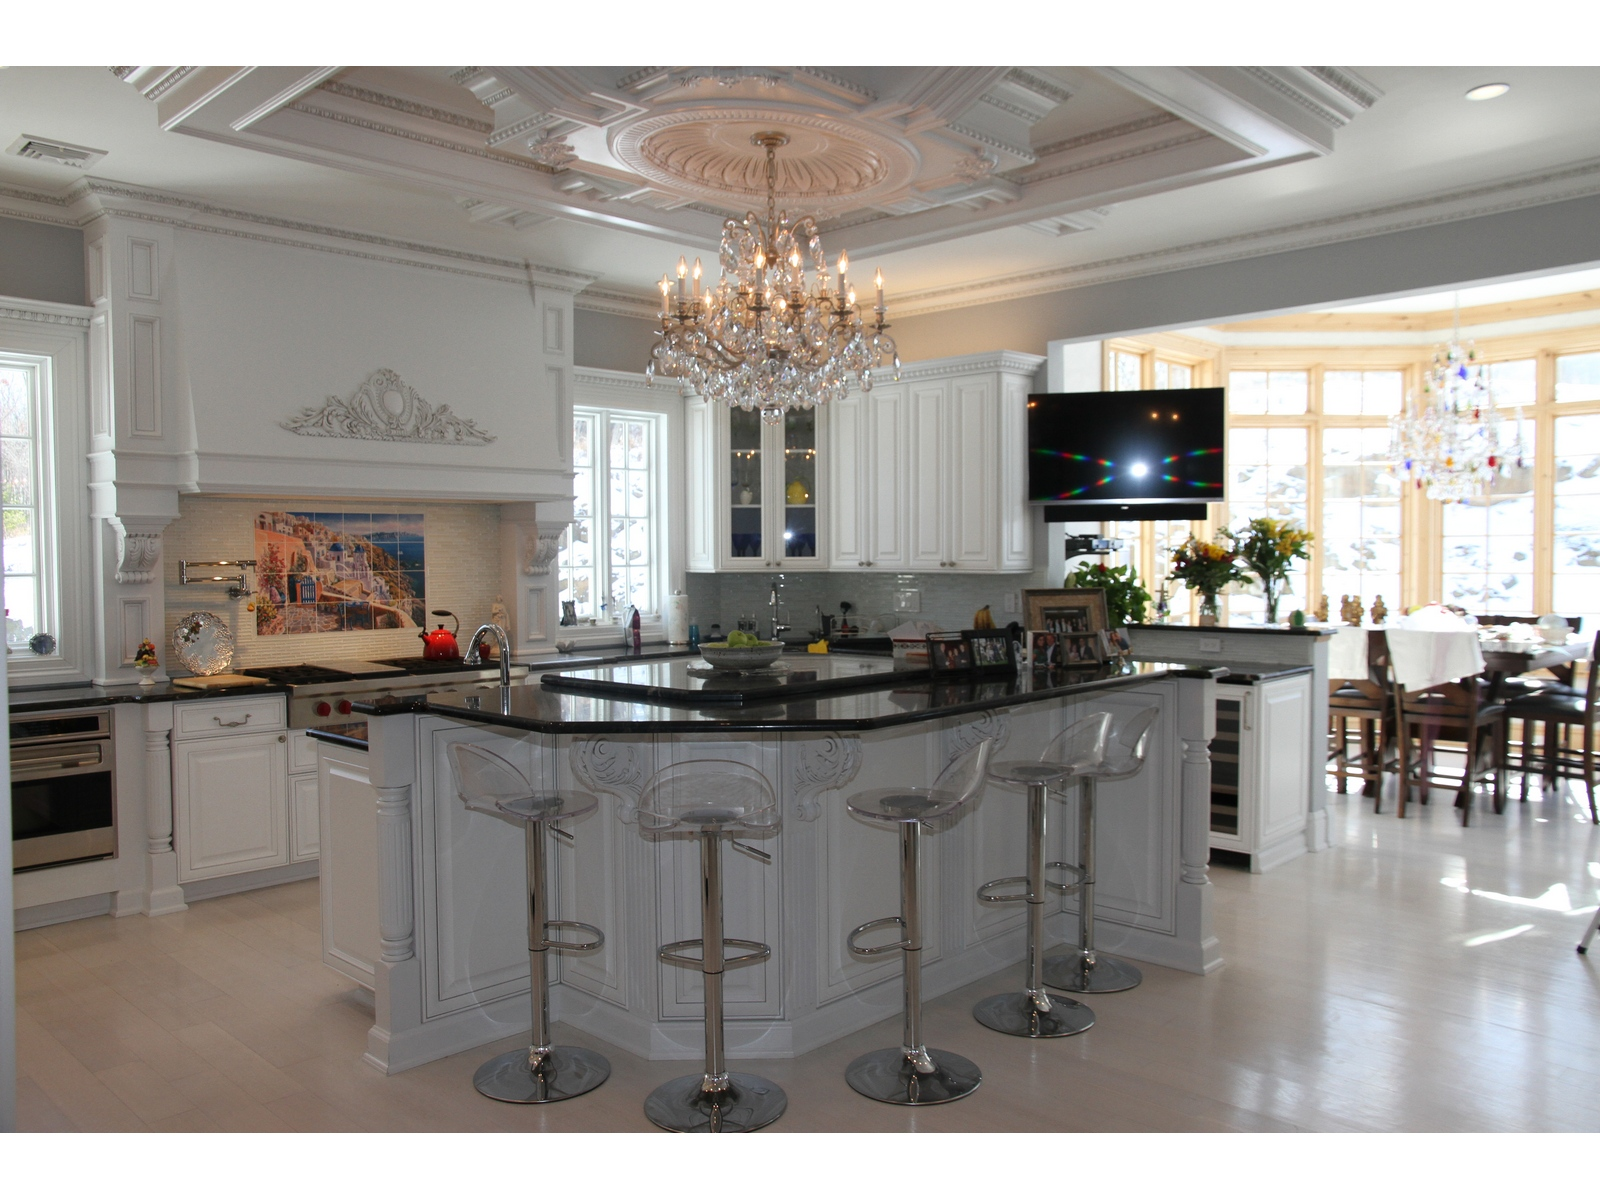 kitchen cabinets high end kitchen cabinets kitchen cabinets